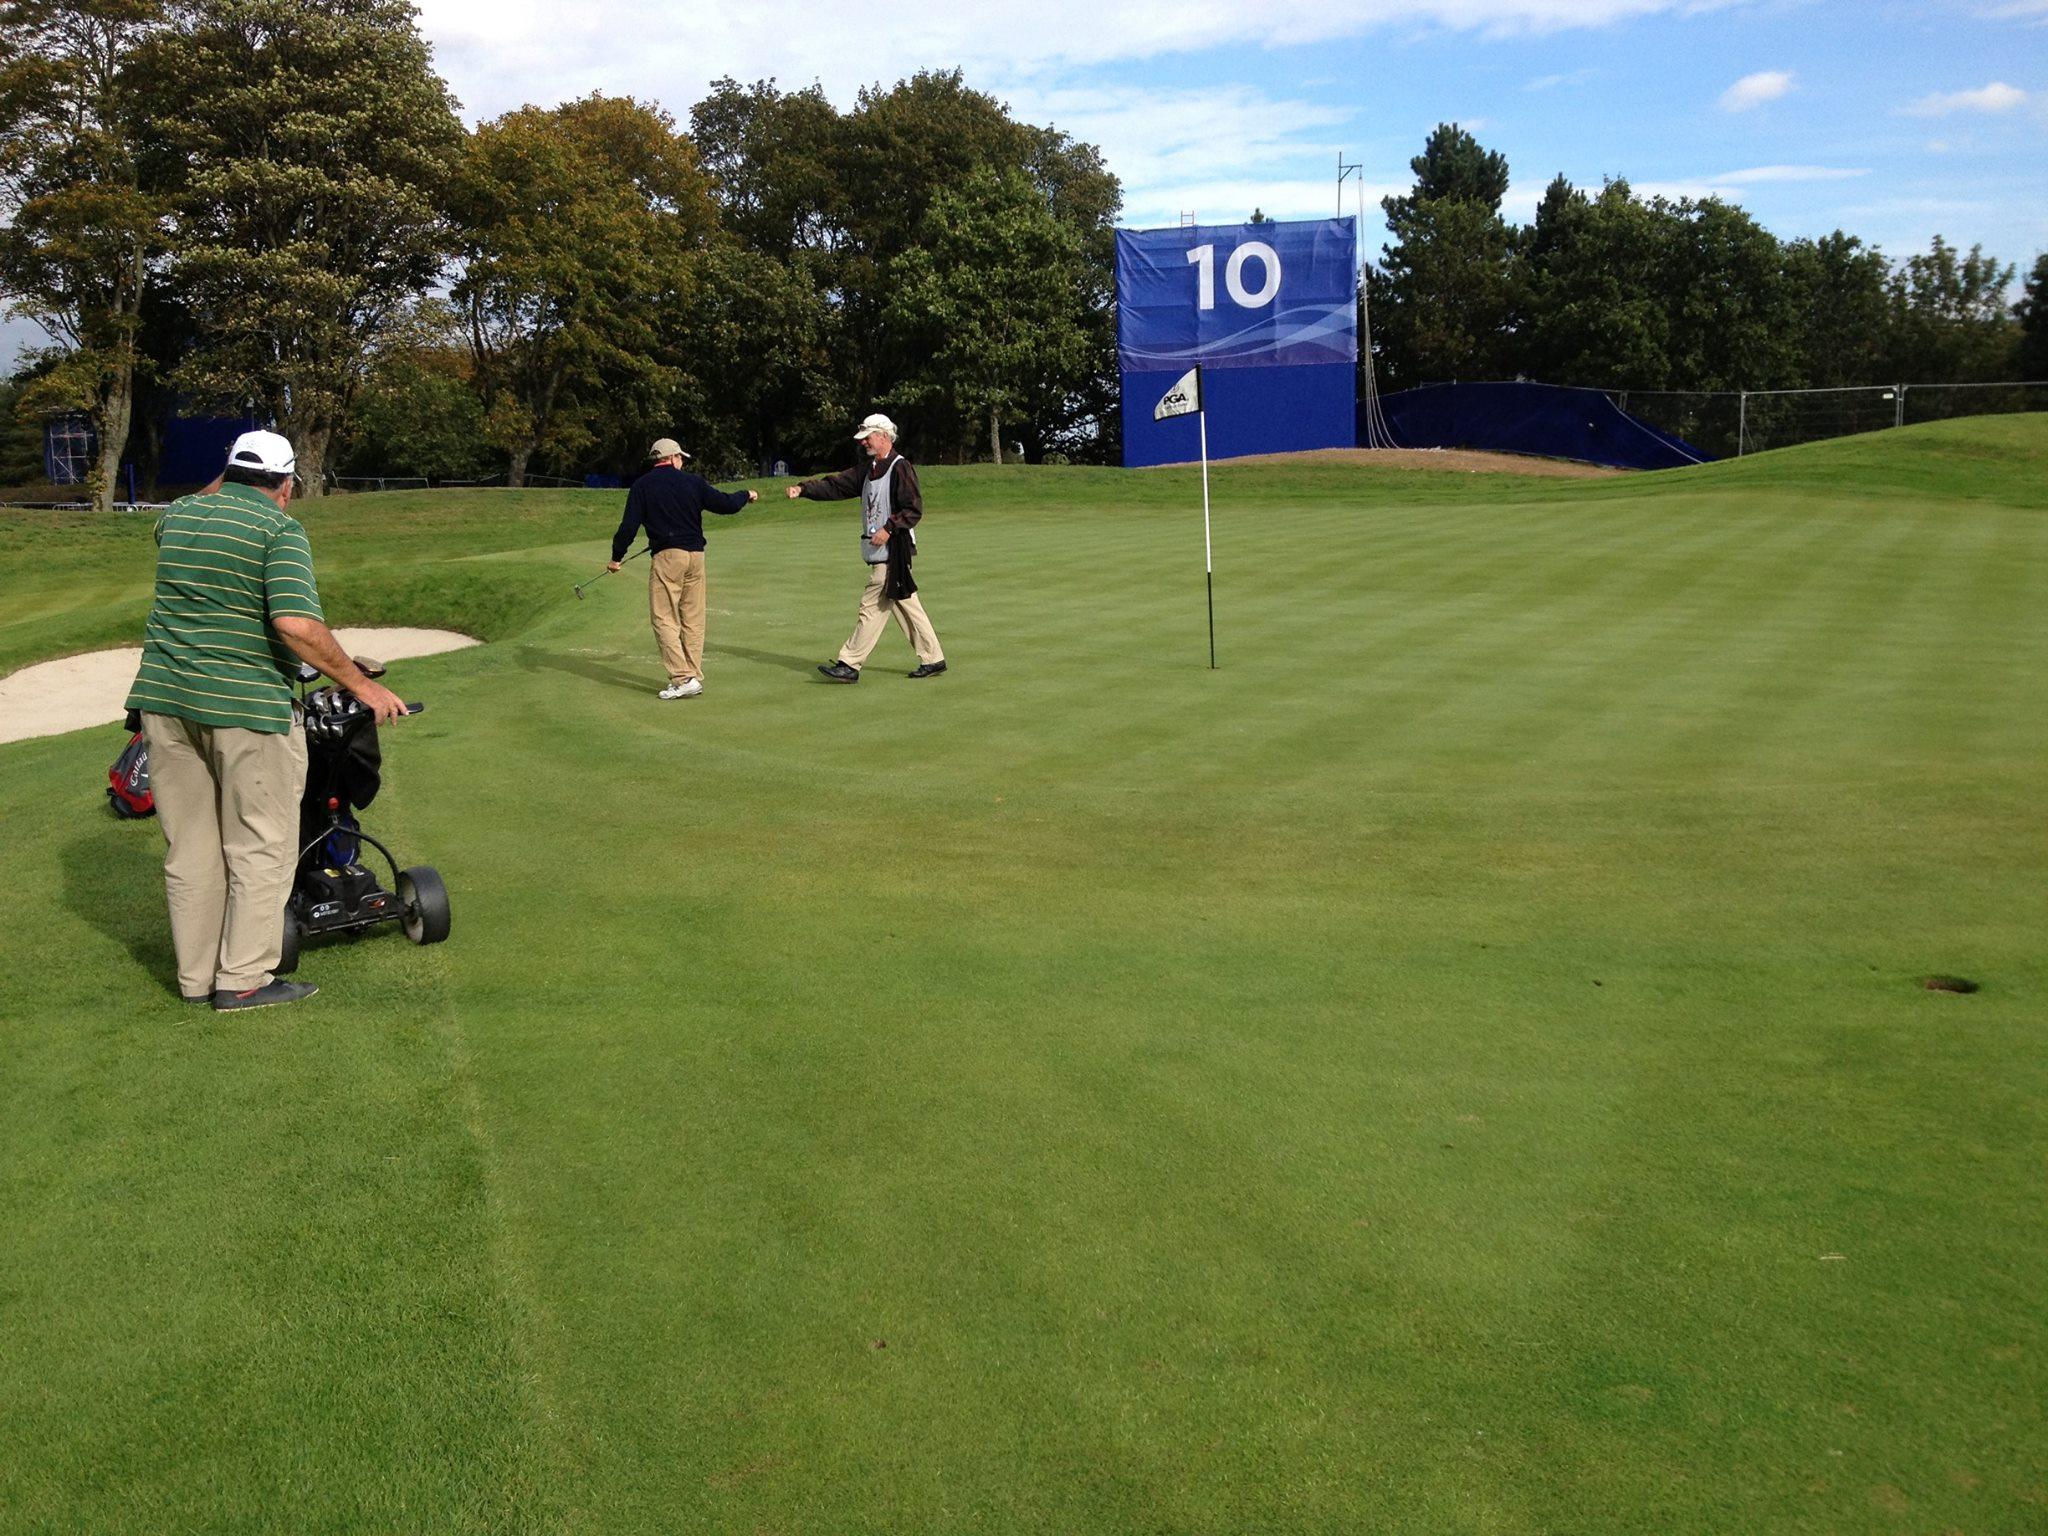 Gleneagles PGA Centenary 10th